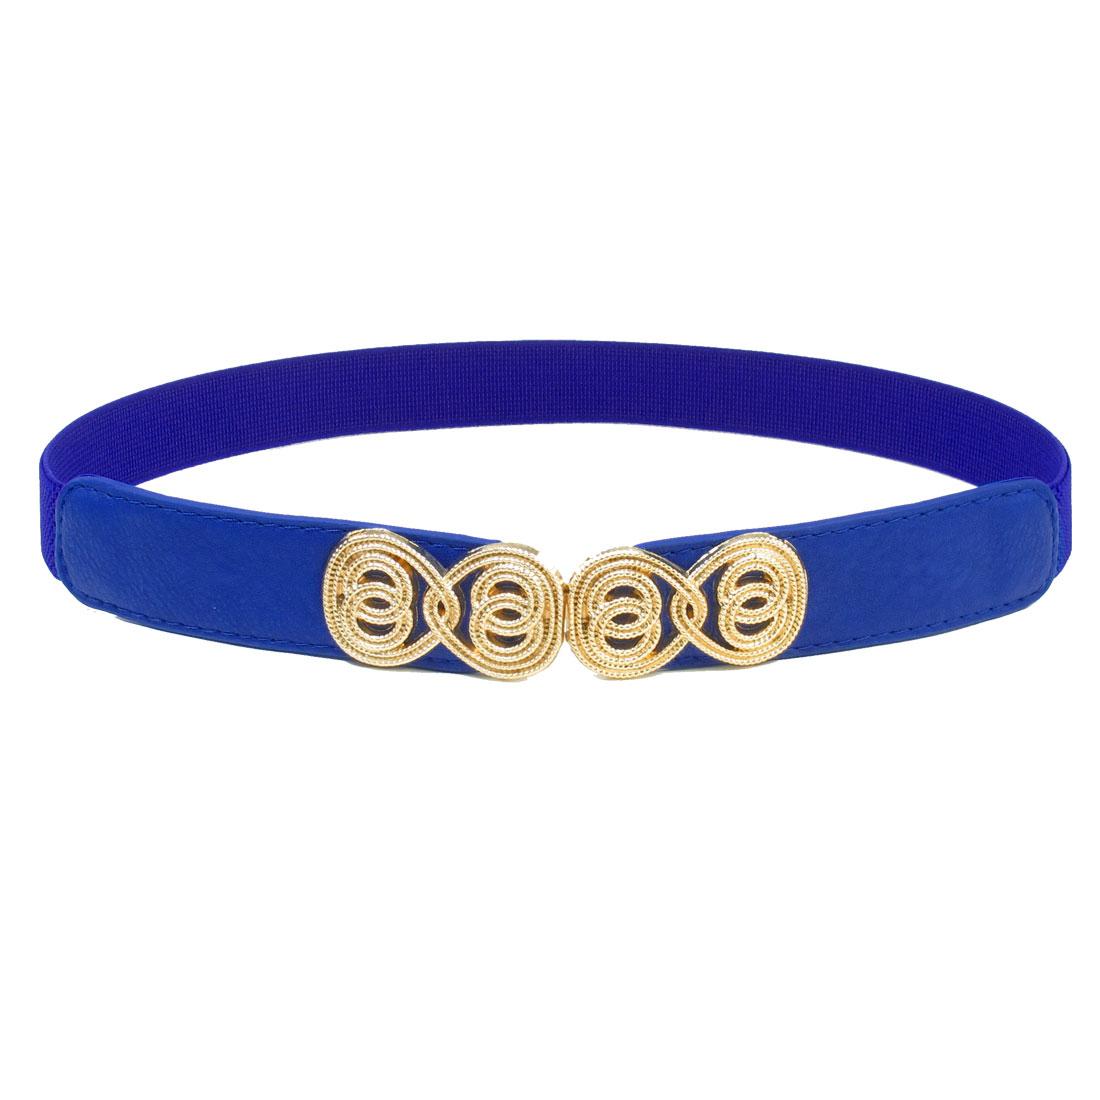 Gold Tone Metalic Detail Heart Interlocking Buckle Belt for Lady Blue